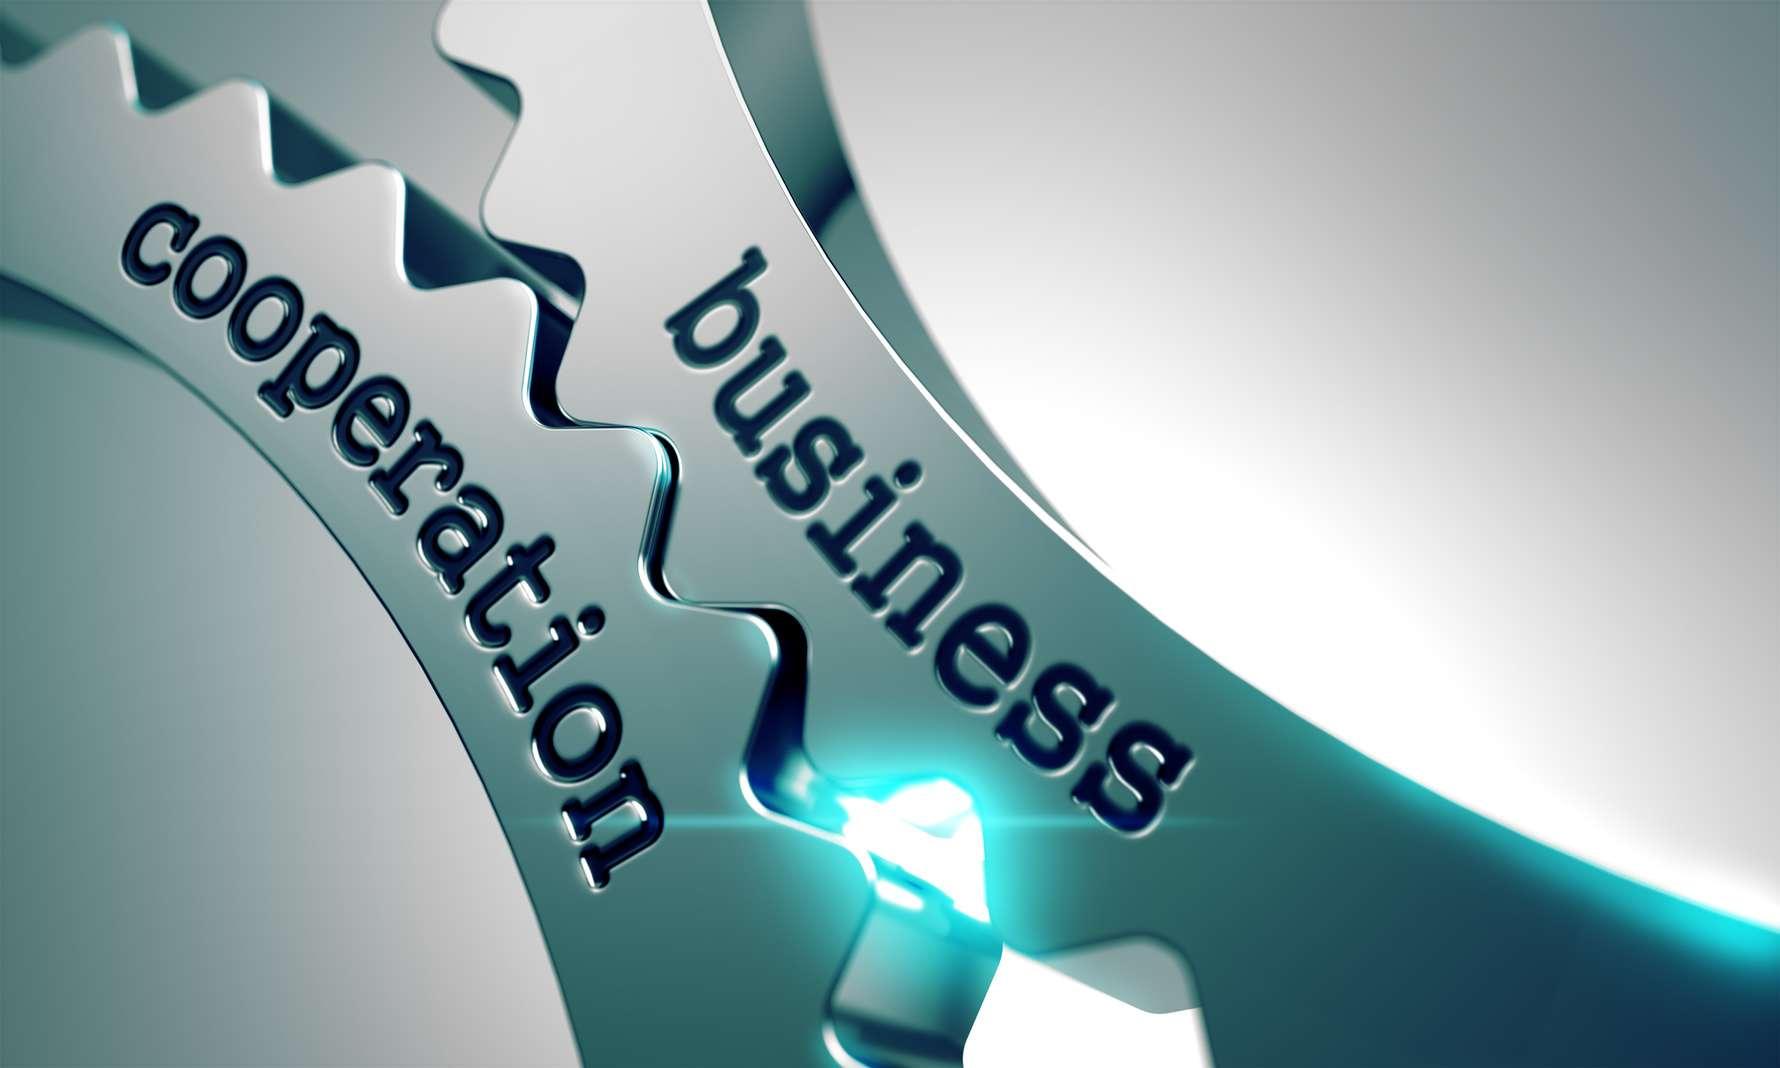 Cooperation Business - Socomate International